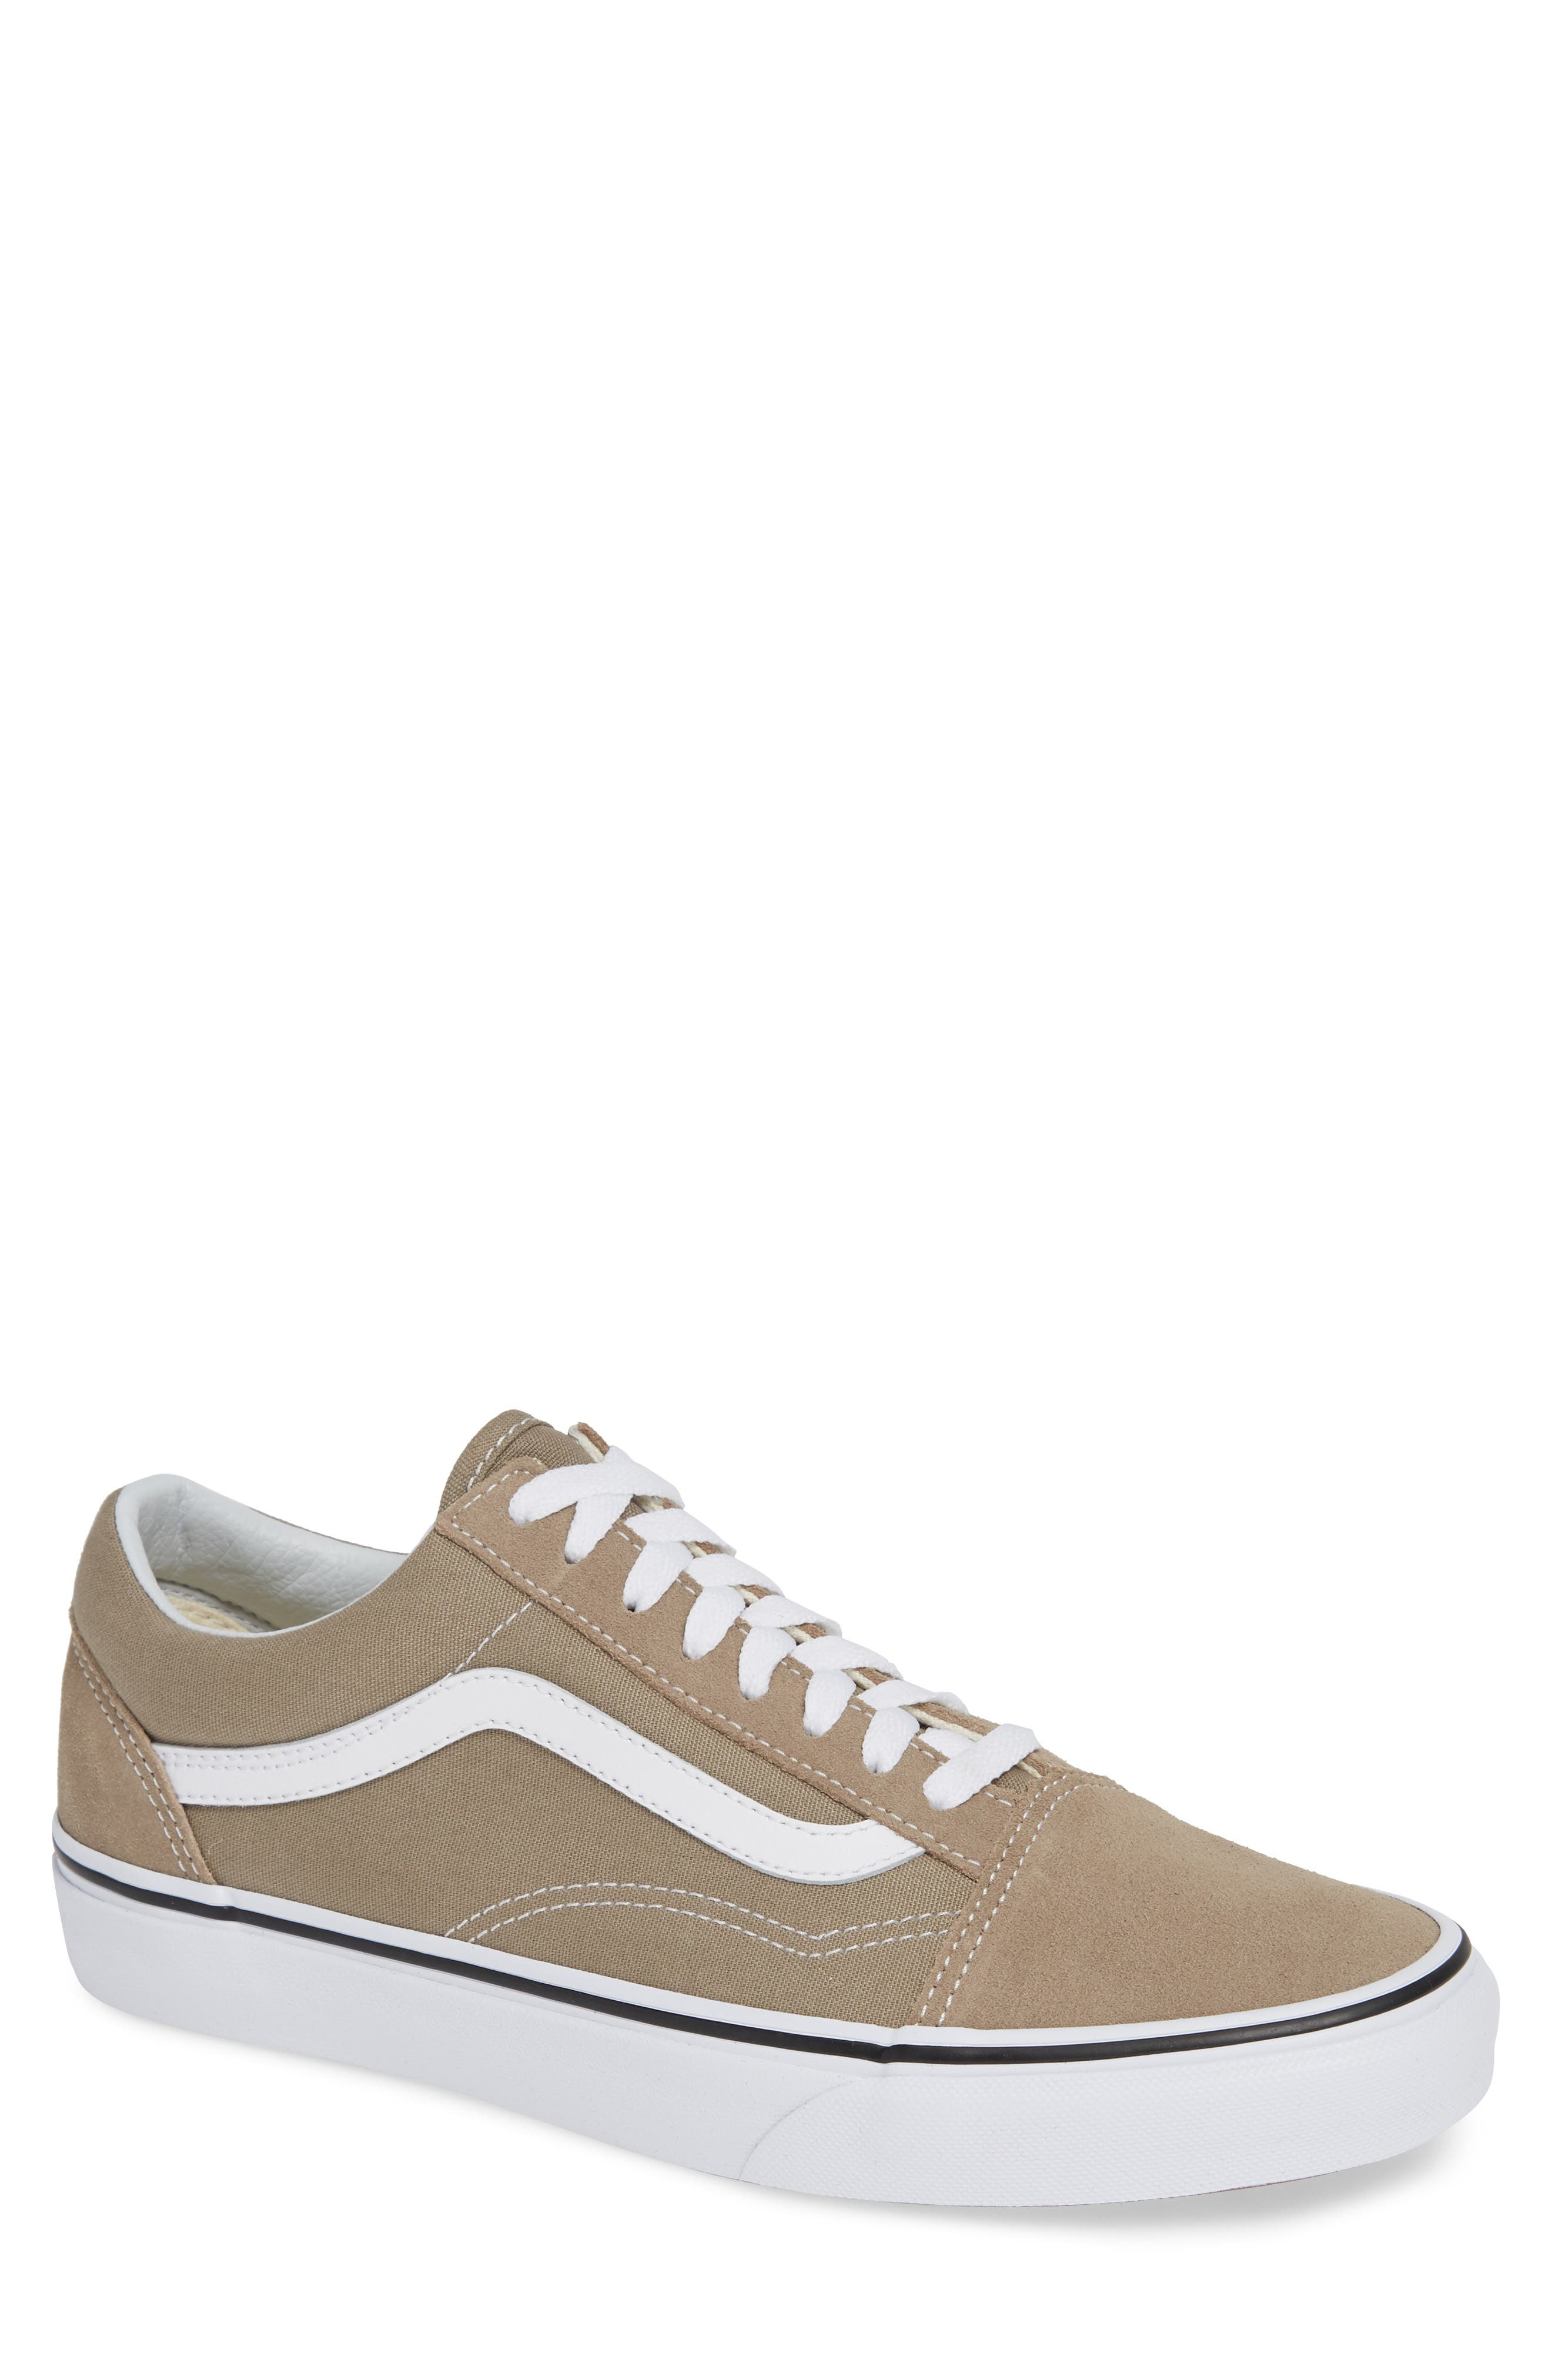 'Old Skool' Sneaker,                         Main,                         color, DESERT TAUPE/ WHITE CANVAS